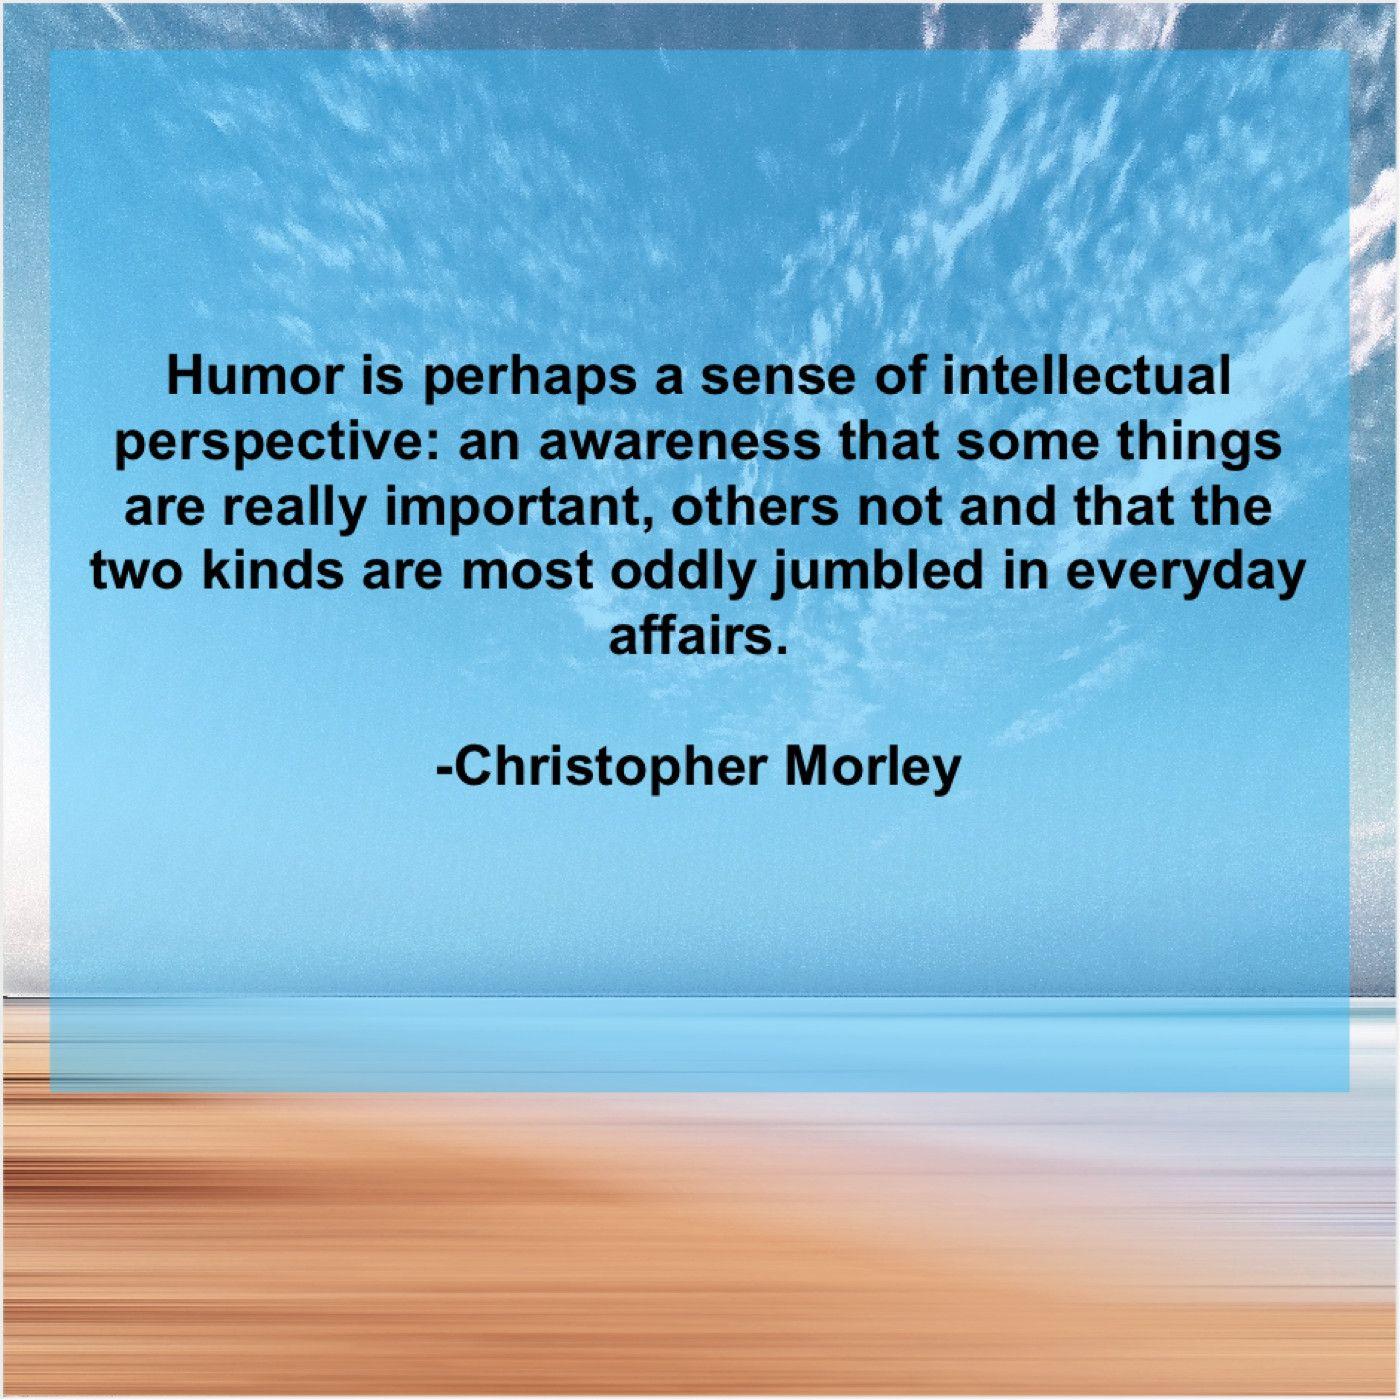 Christopher Morley Humor Is Perhaps A Sense Humor Viral Quotes Christopher Morley